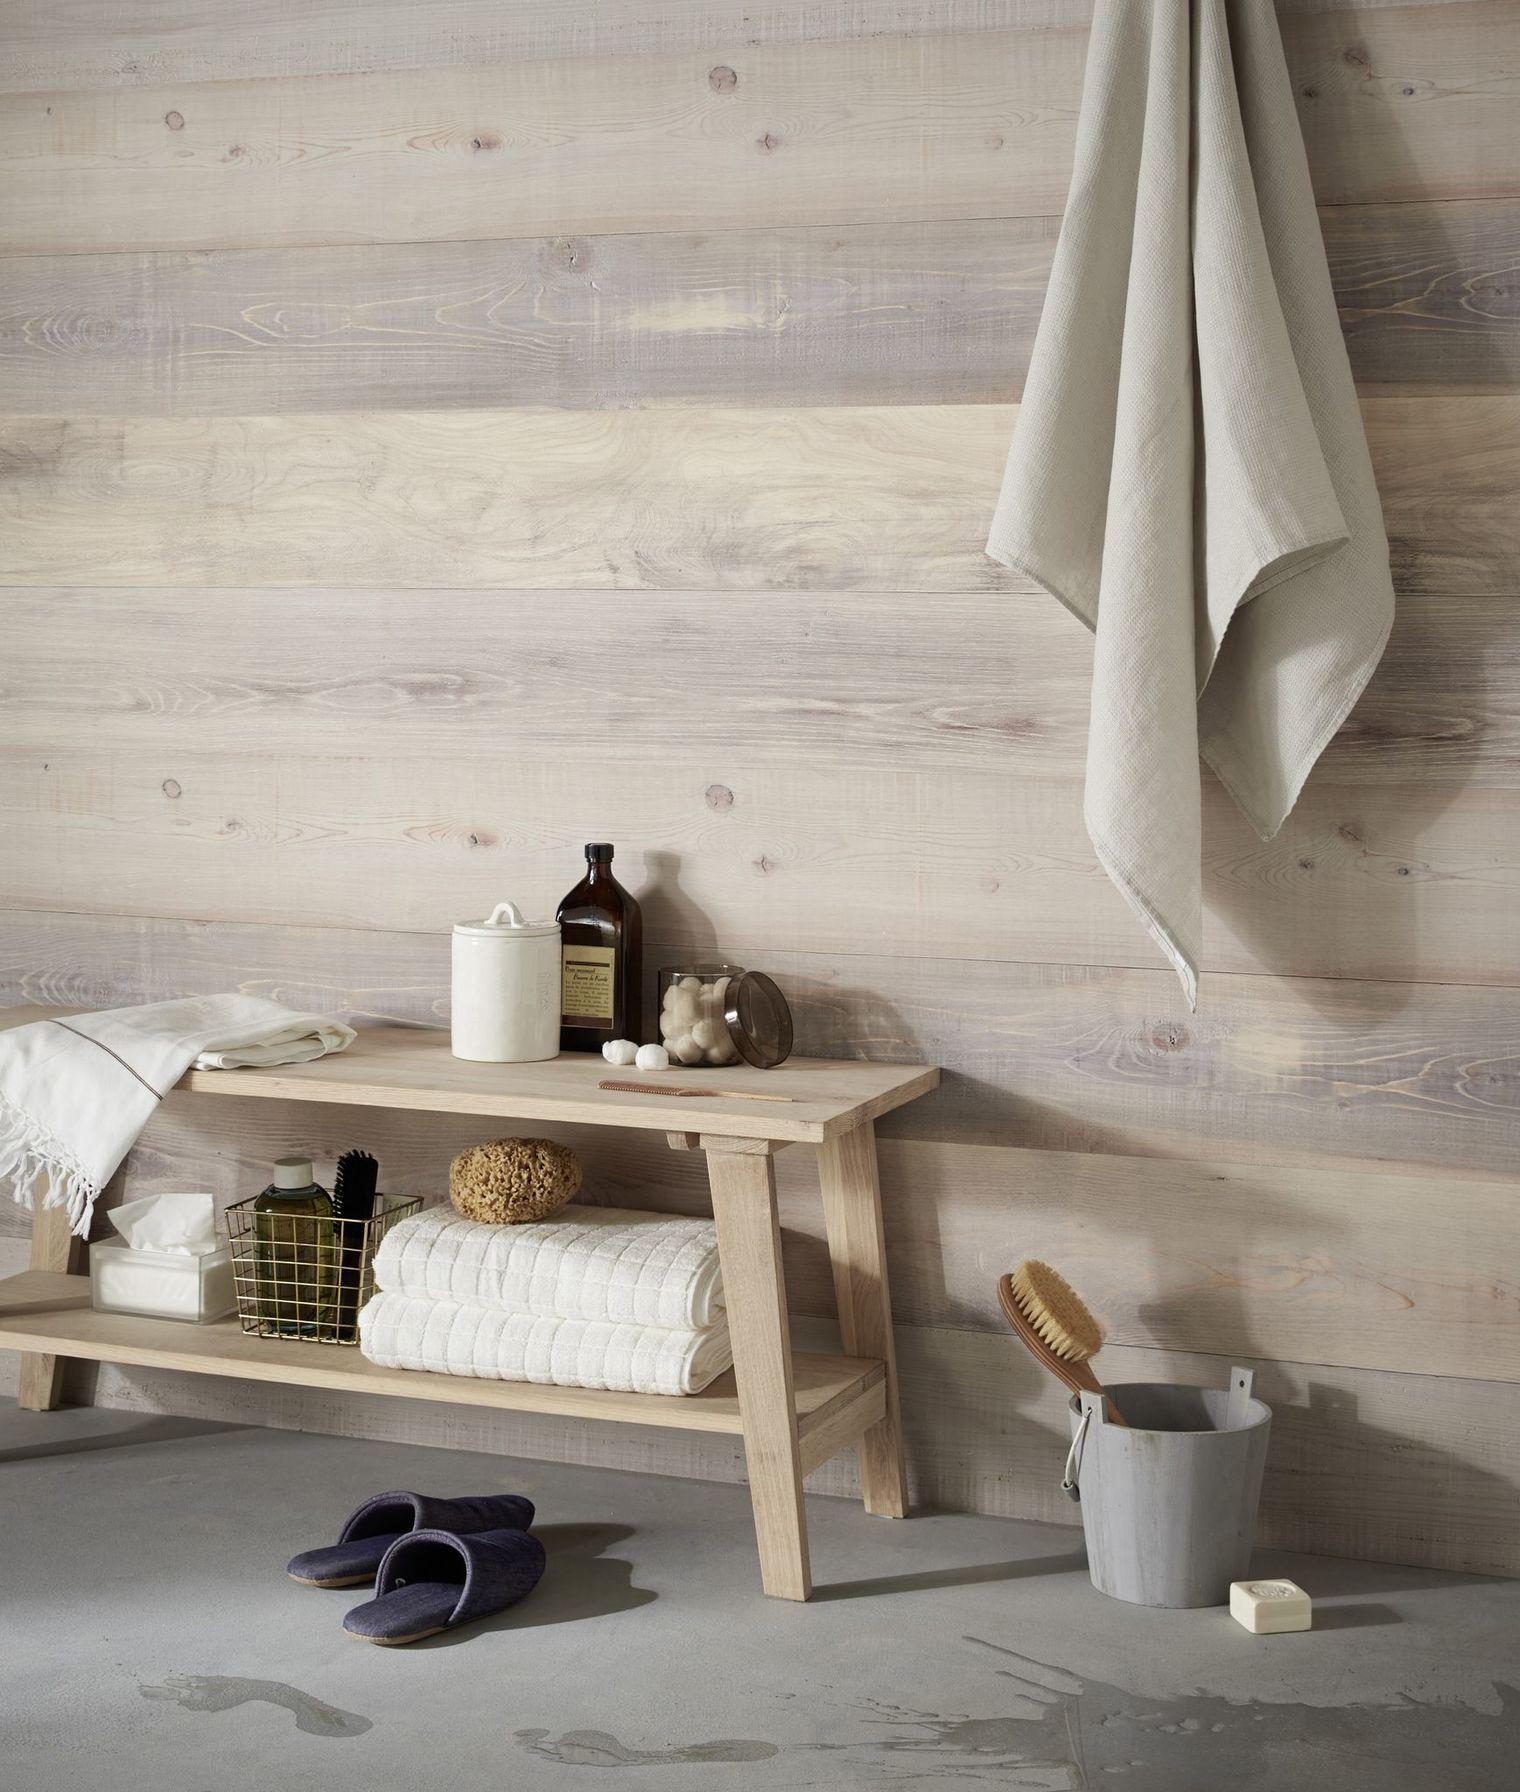 Sol Et Mur Salle De Bain Quoi Choisir Home Decor Flooring Shelves